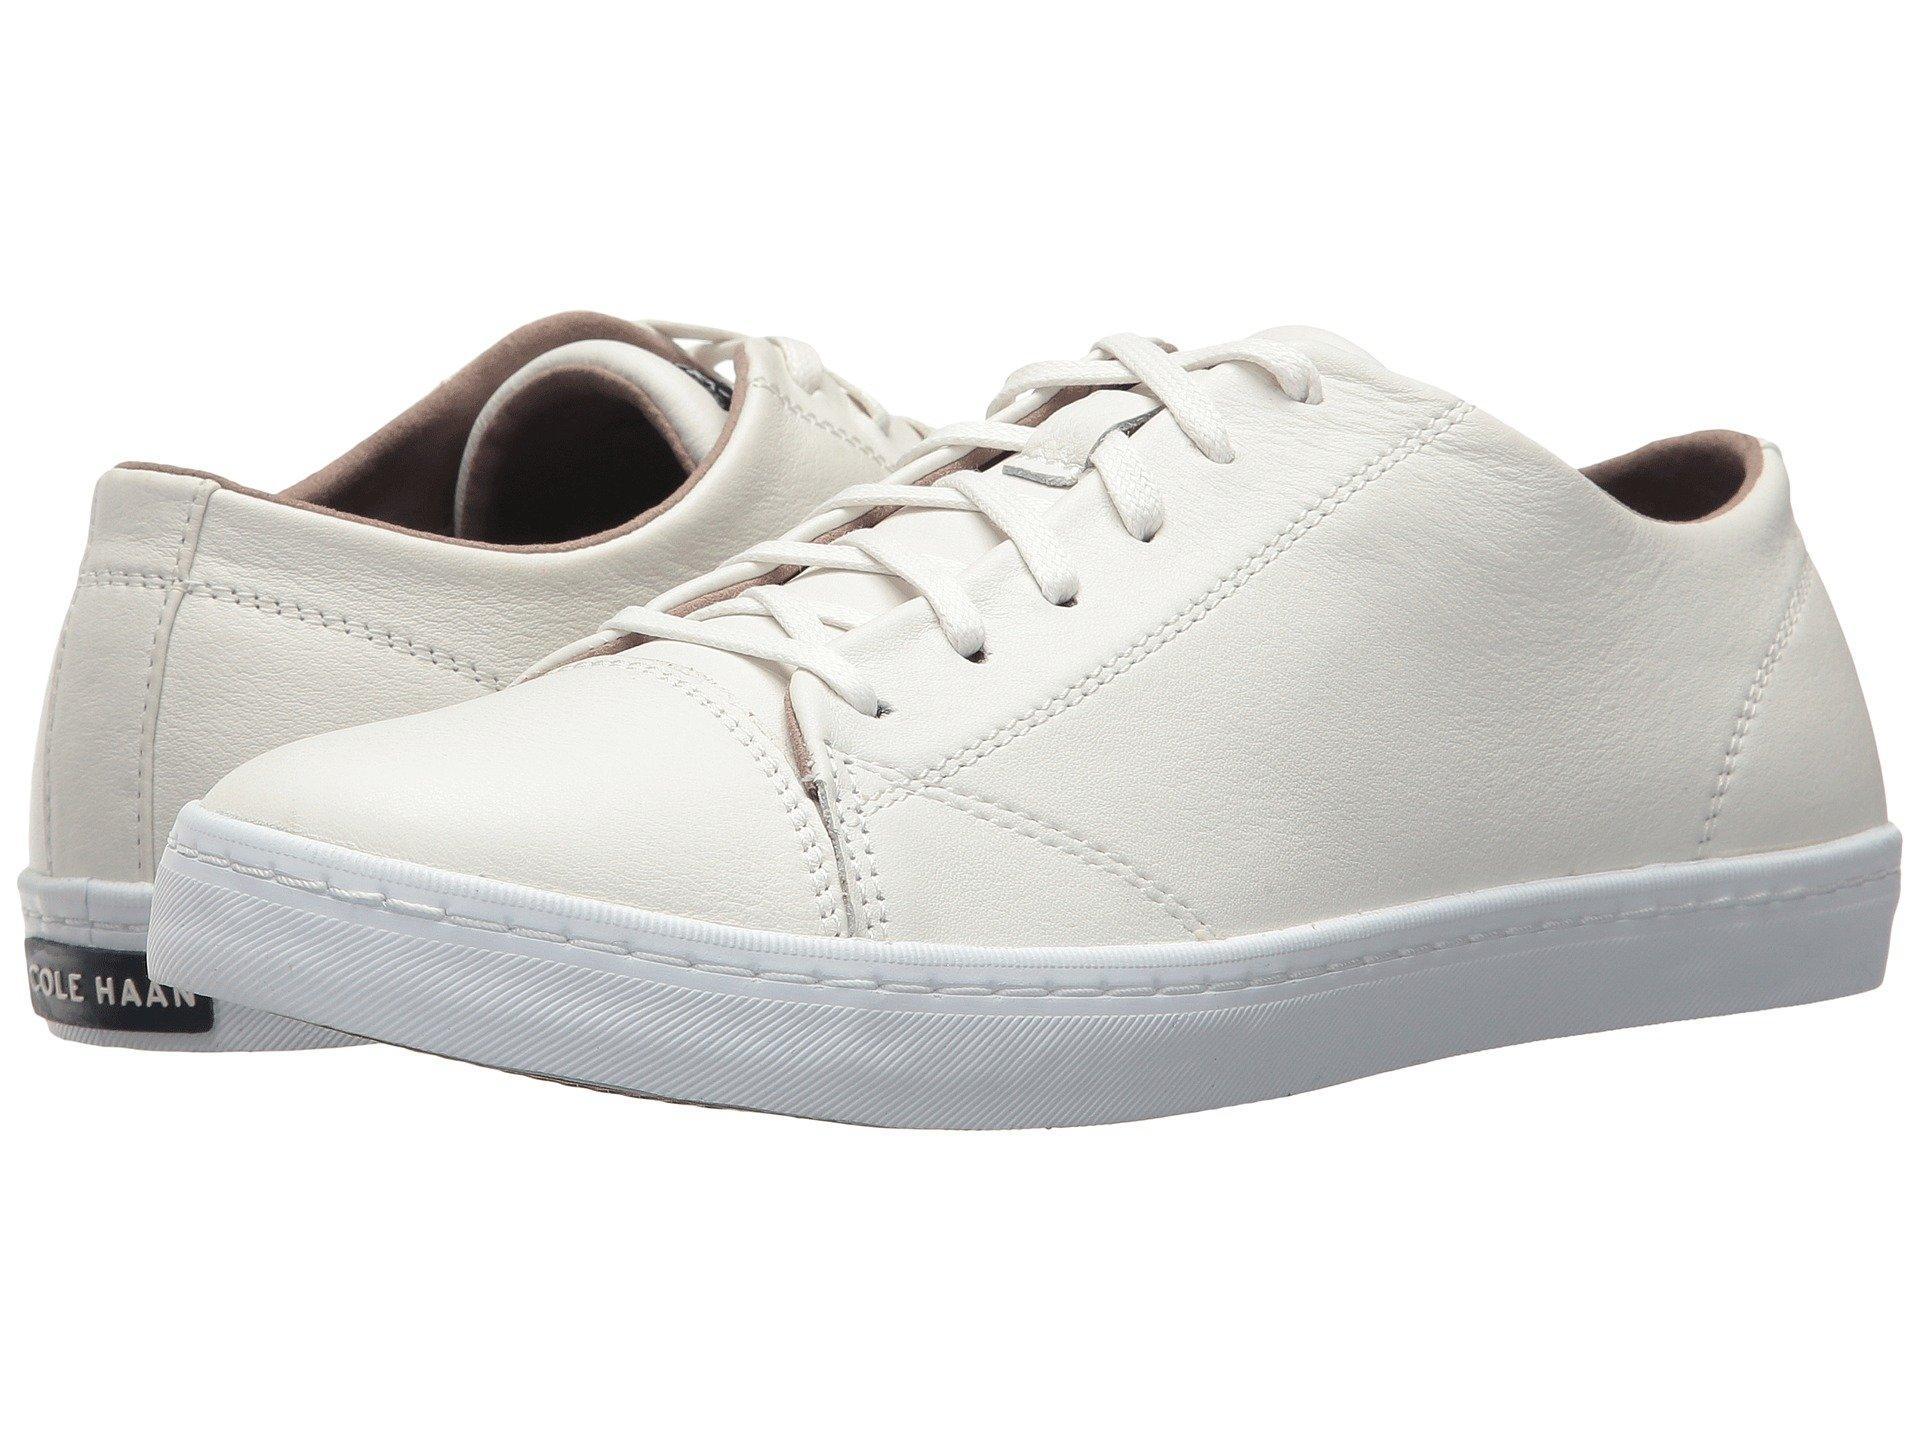 Cole Haan Trafton Lux Cap Toe Ox Ii In Optic White Leather